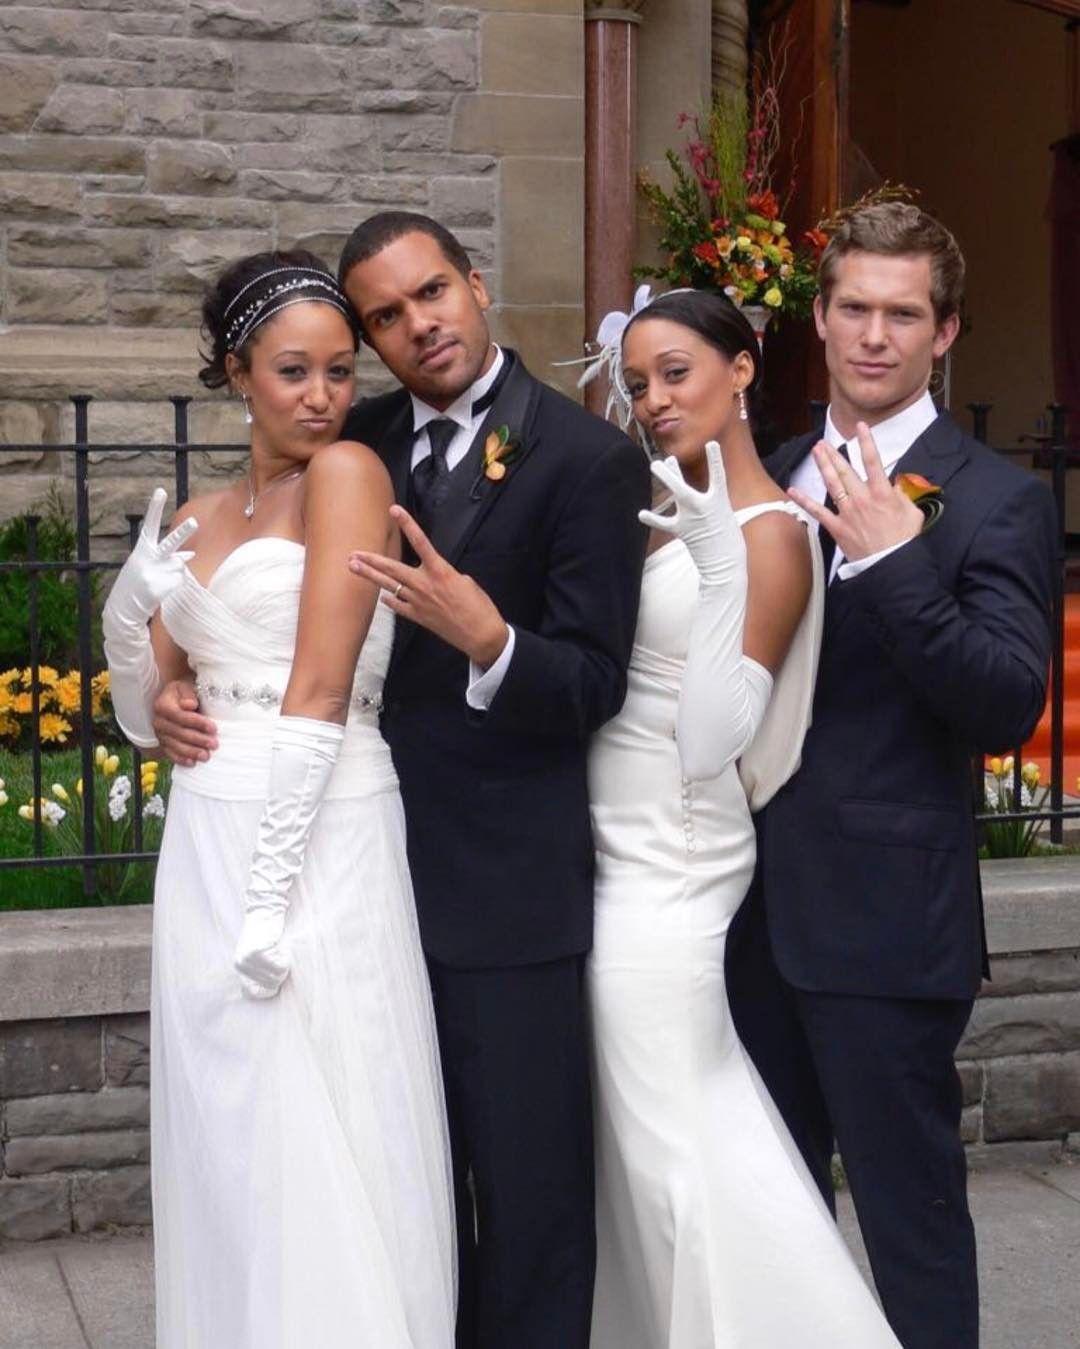 Tia And Tamera Mowry Sister Sister Twins Double Wedding Celebrity Weddings Groom And Groomsmen Attire